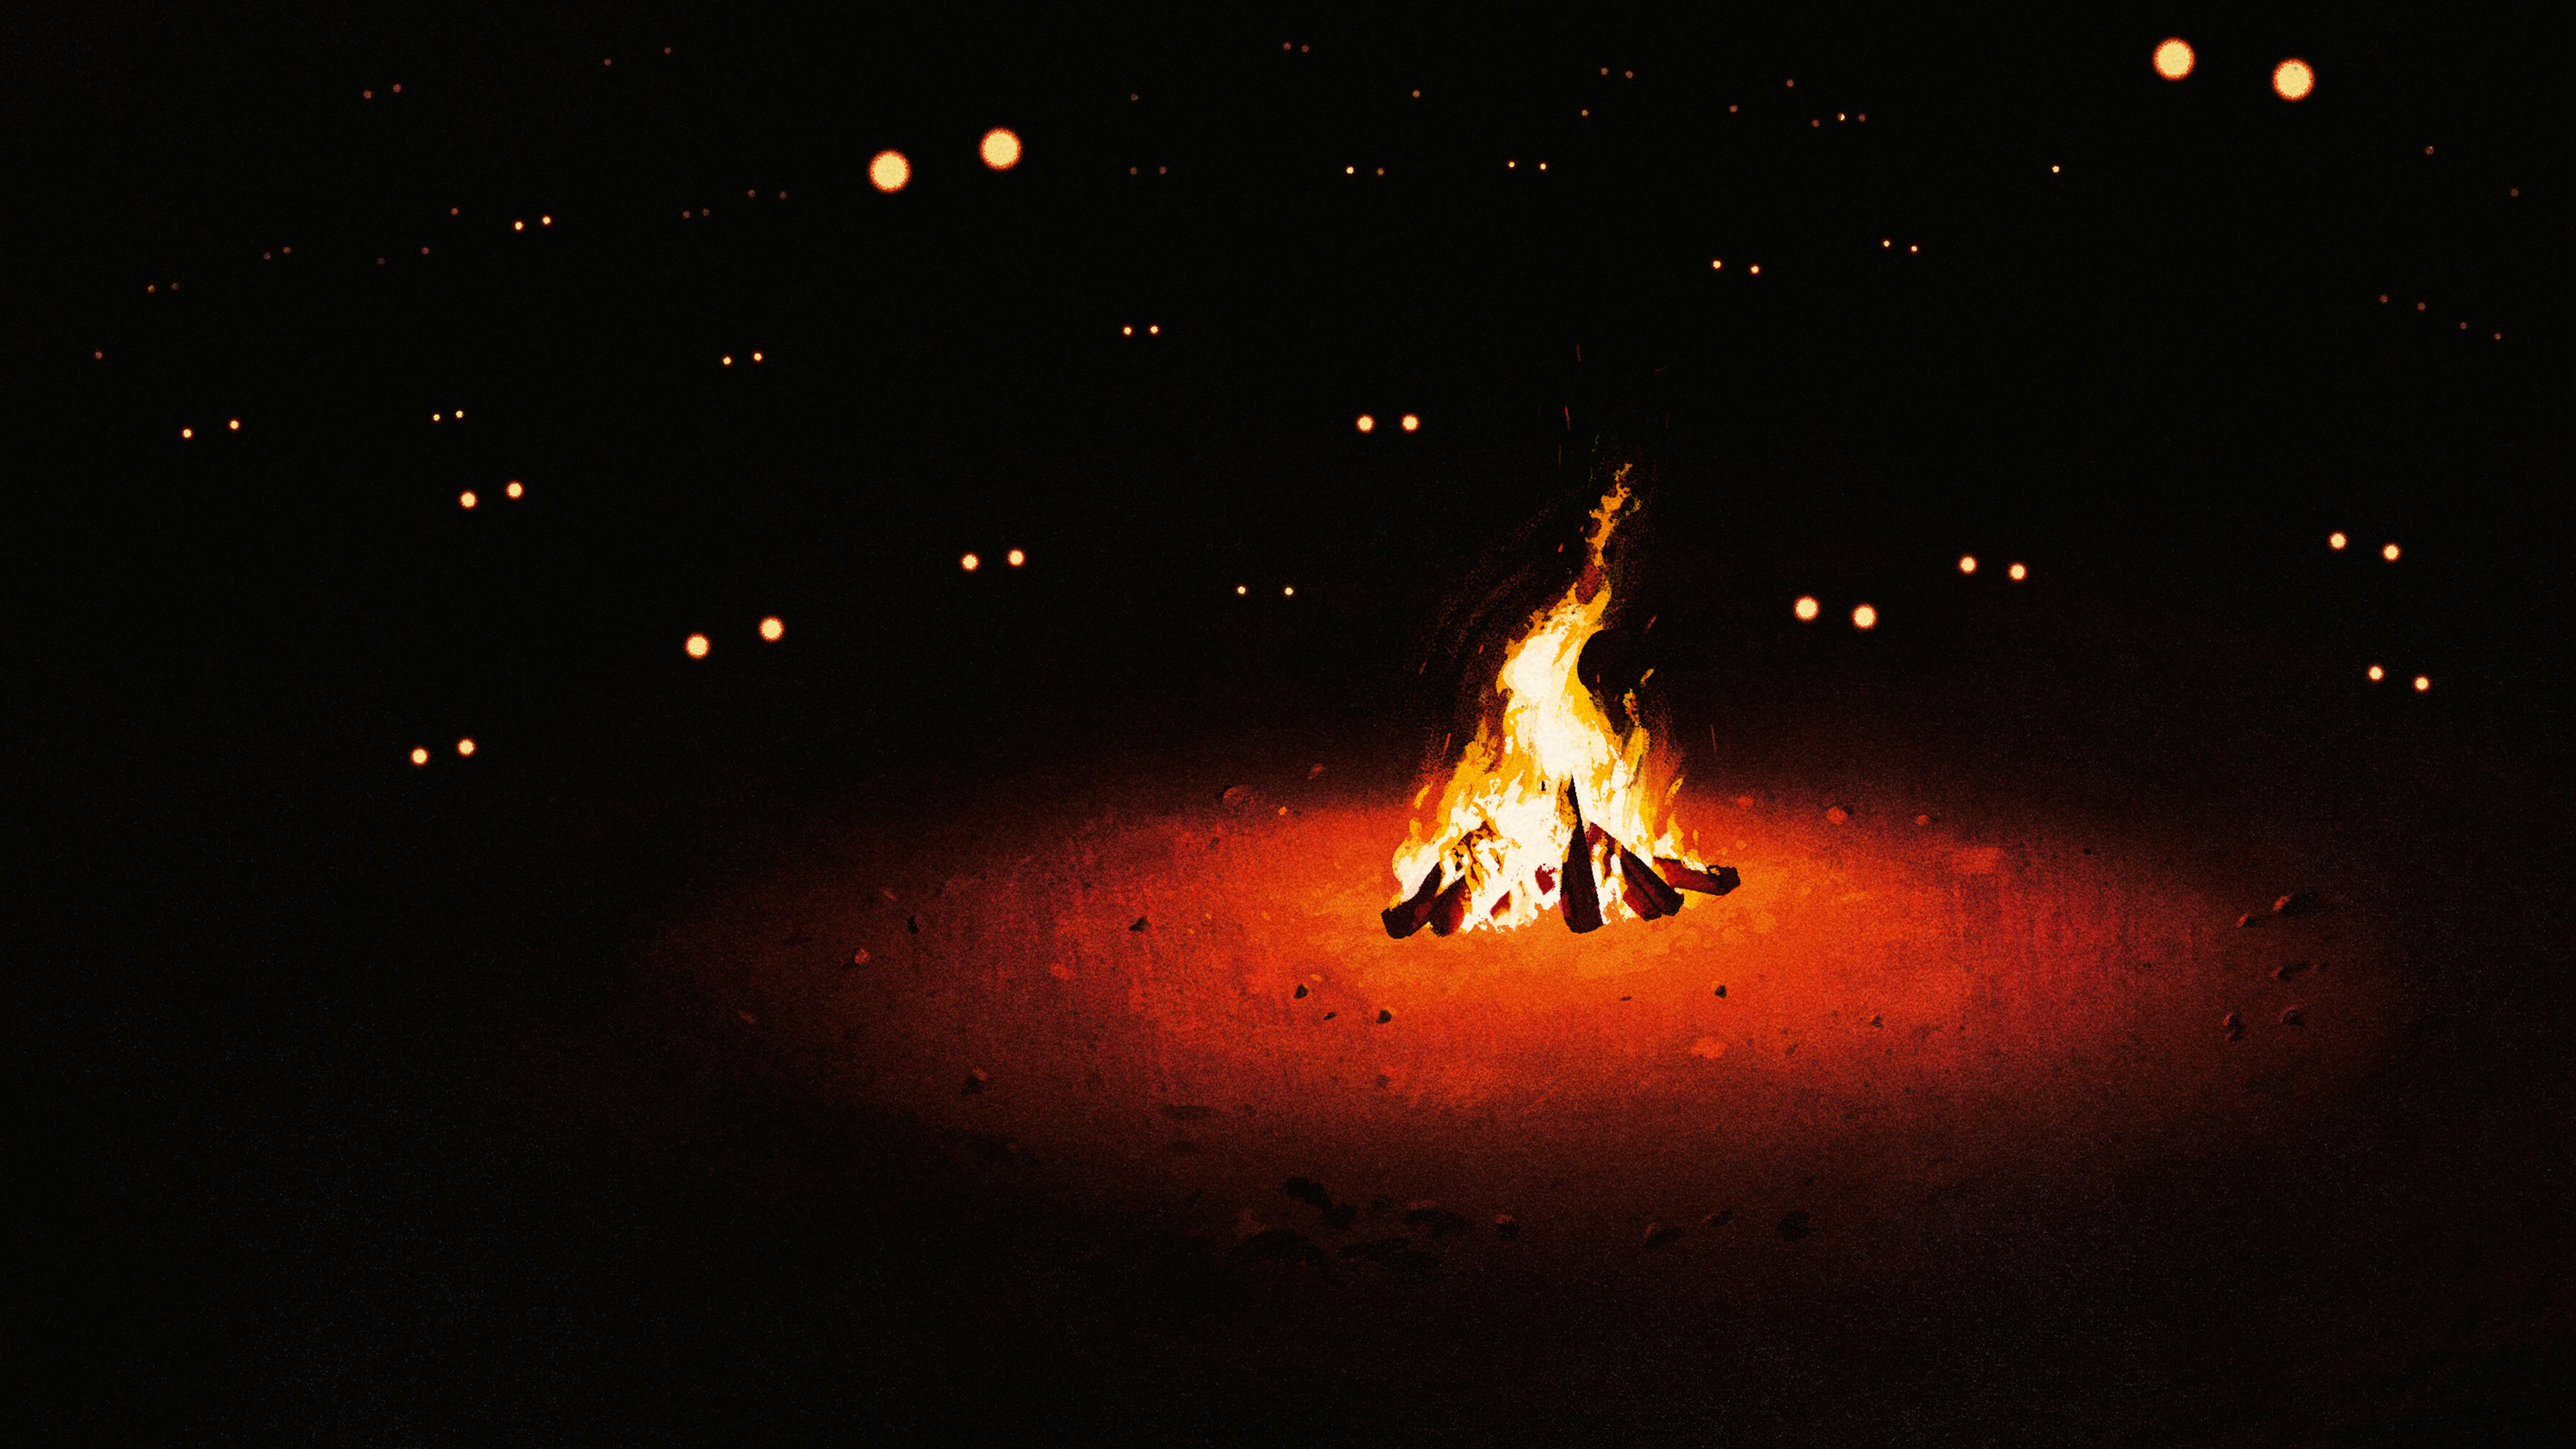 Illustration Fire Burning Fireplace Eyes Simple Background Black Background Artwork 3840x2160